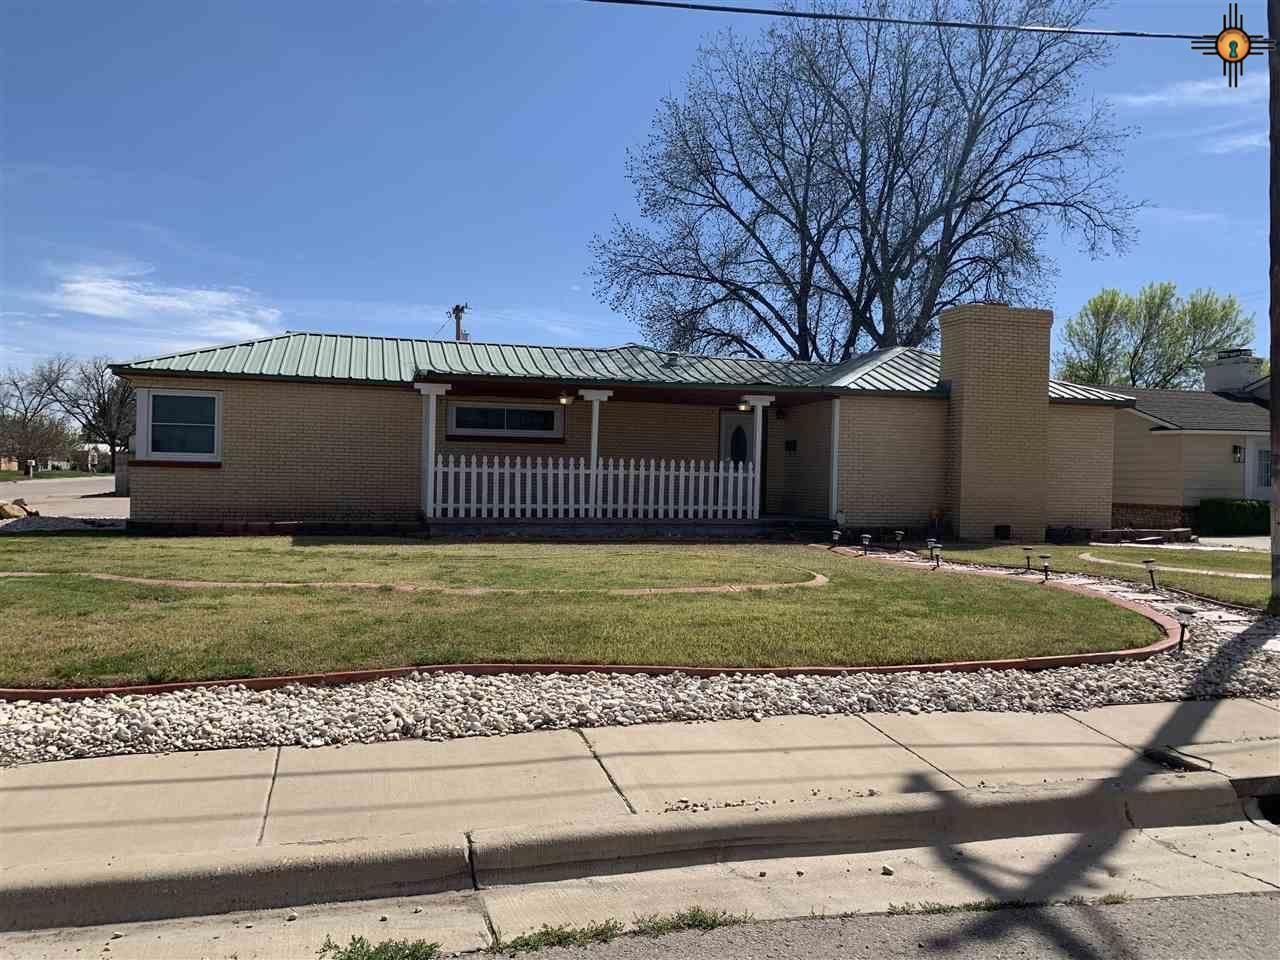 401 W Bullock, Artesia, NM 88210 - #: 20196127